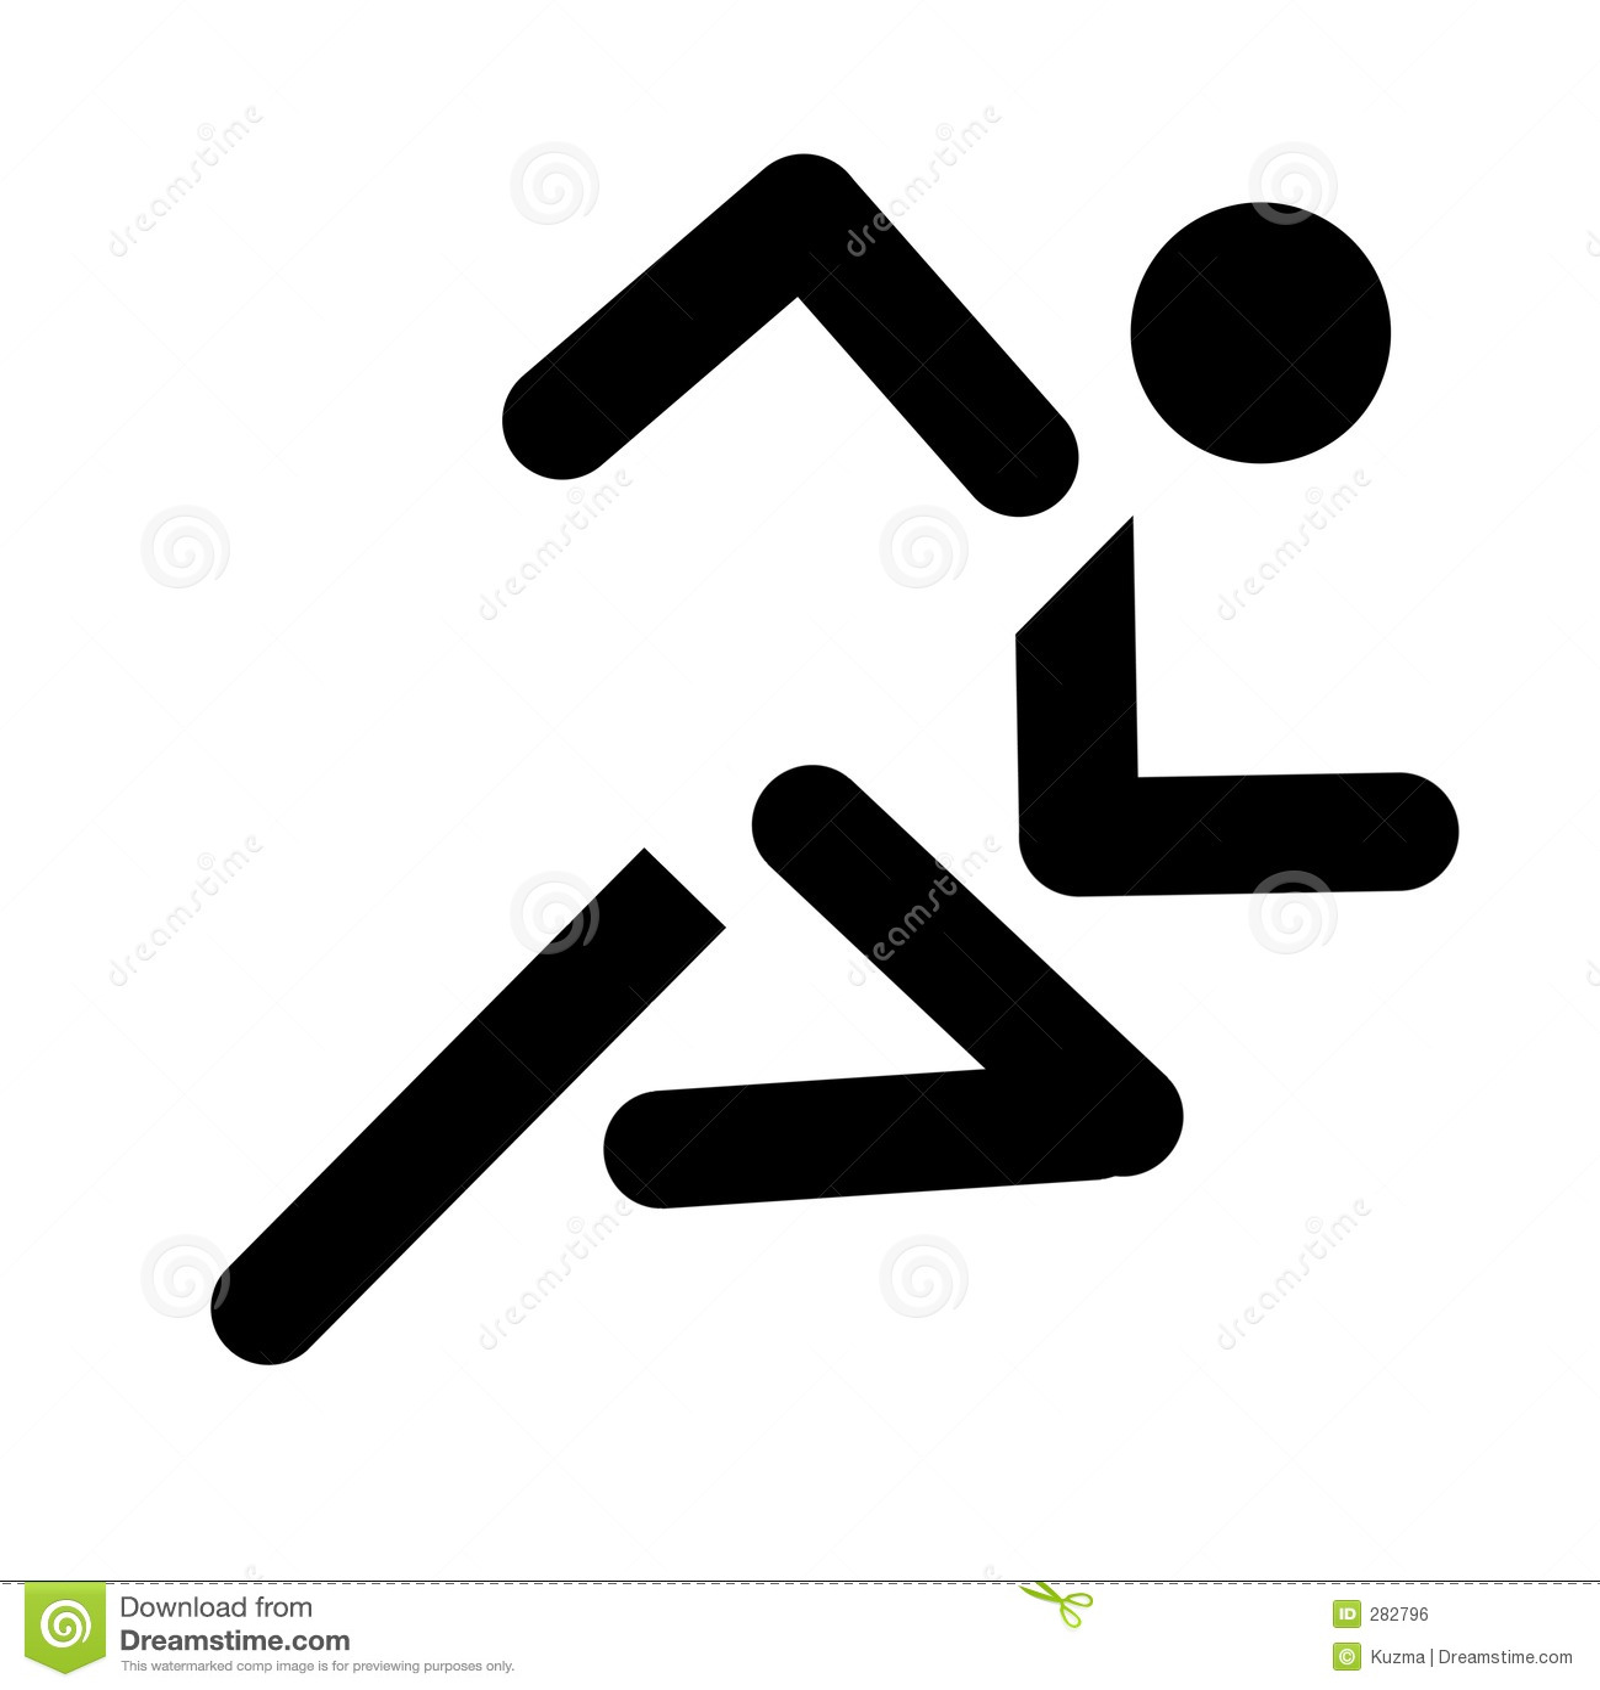 Running Sport Symbol Royalty Free Stock Image - Image: 282796